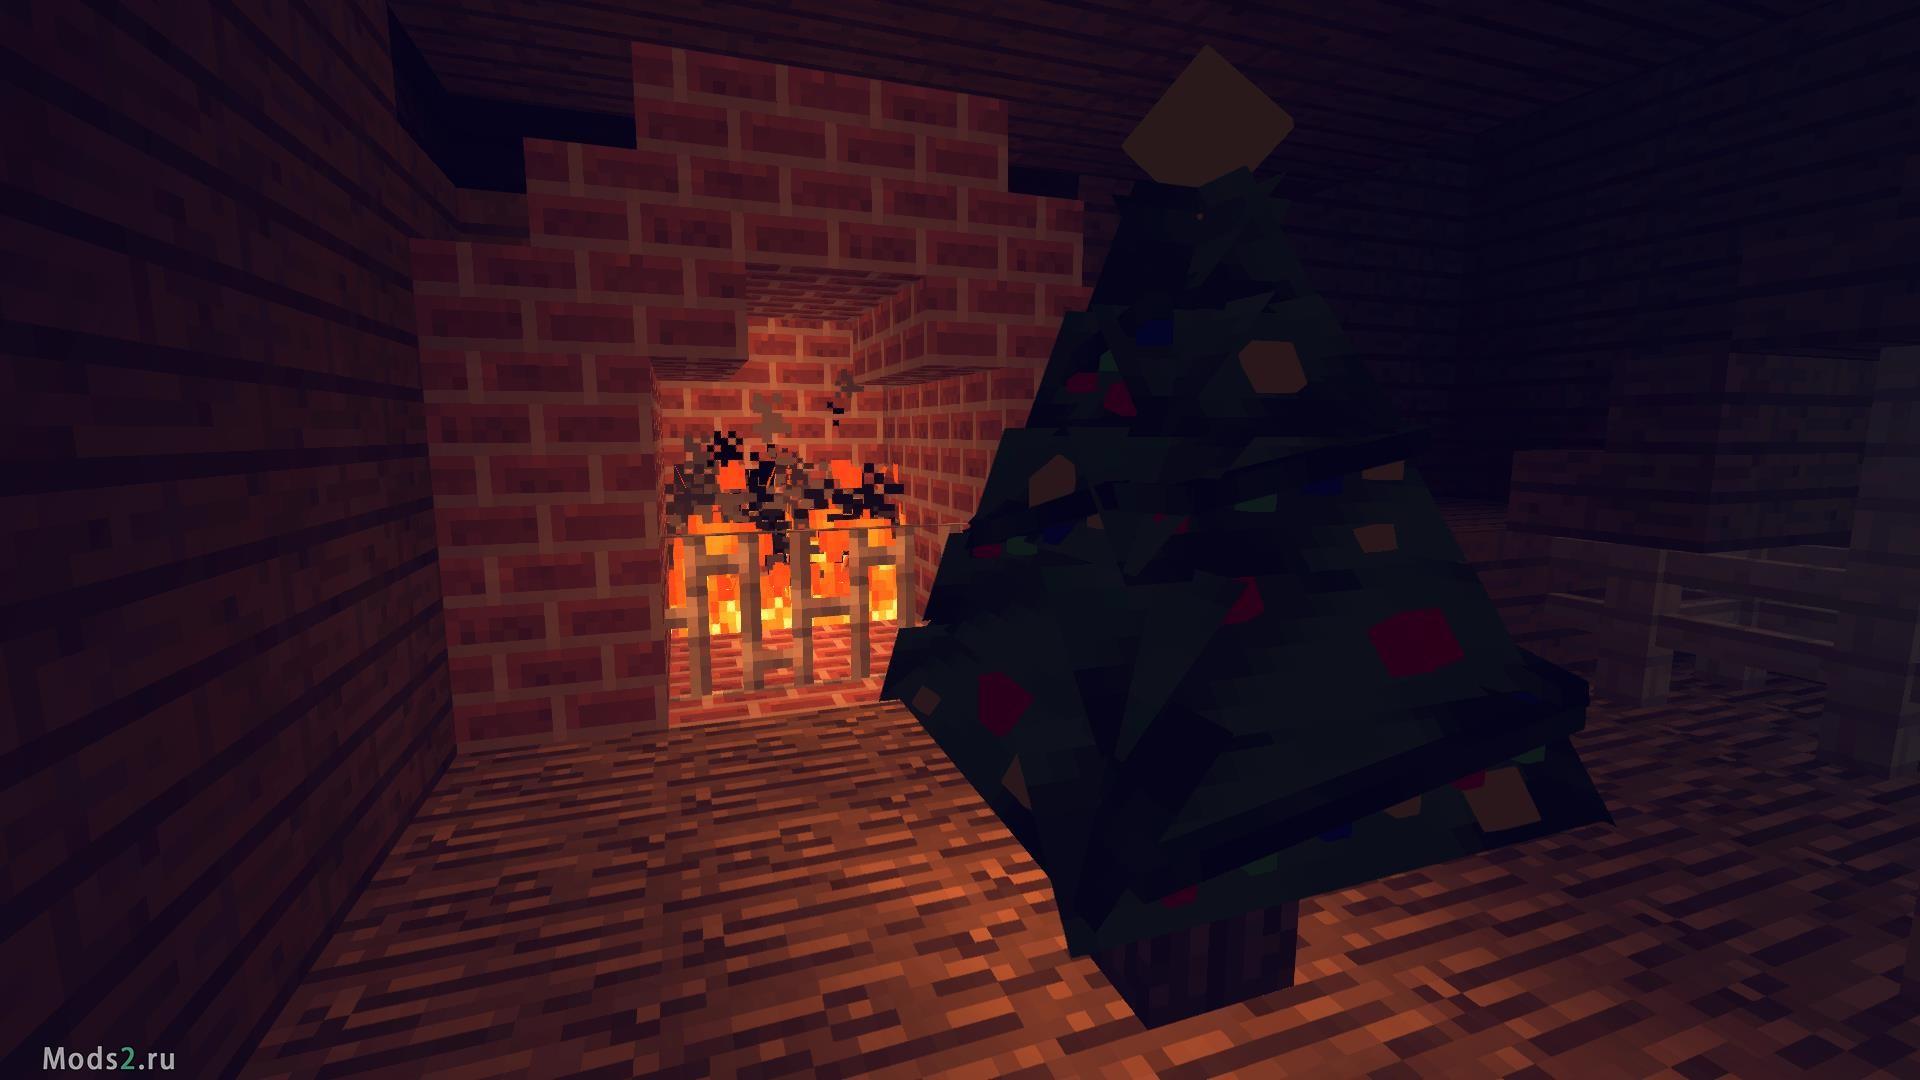 Новогодняя Ёлка для дома - Decoratable Christmas Trees Mod 1.12.2 ... 631dacef17b